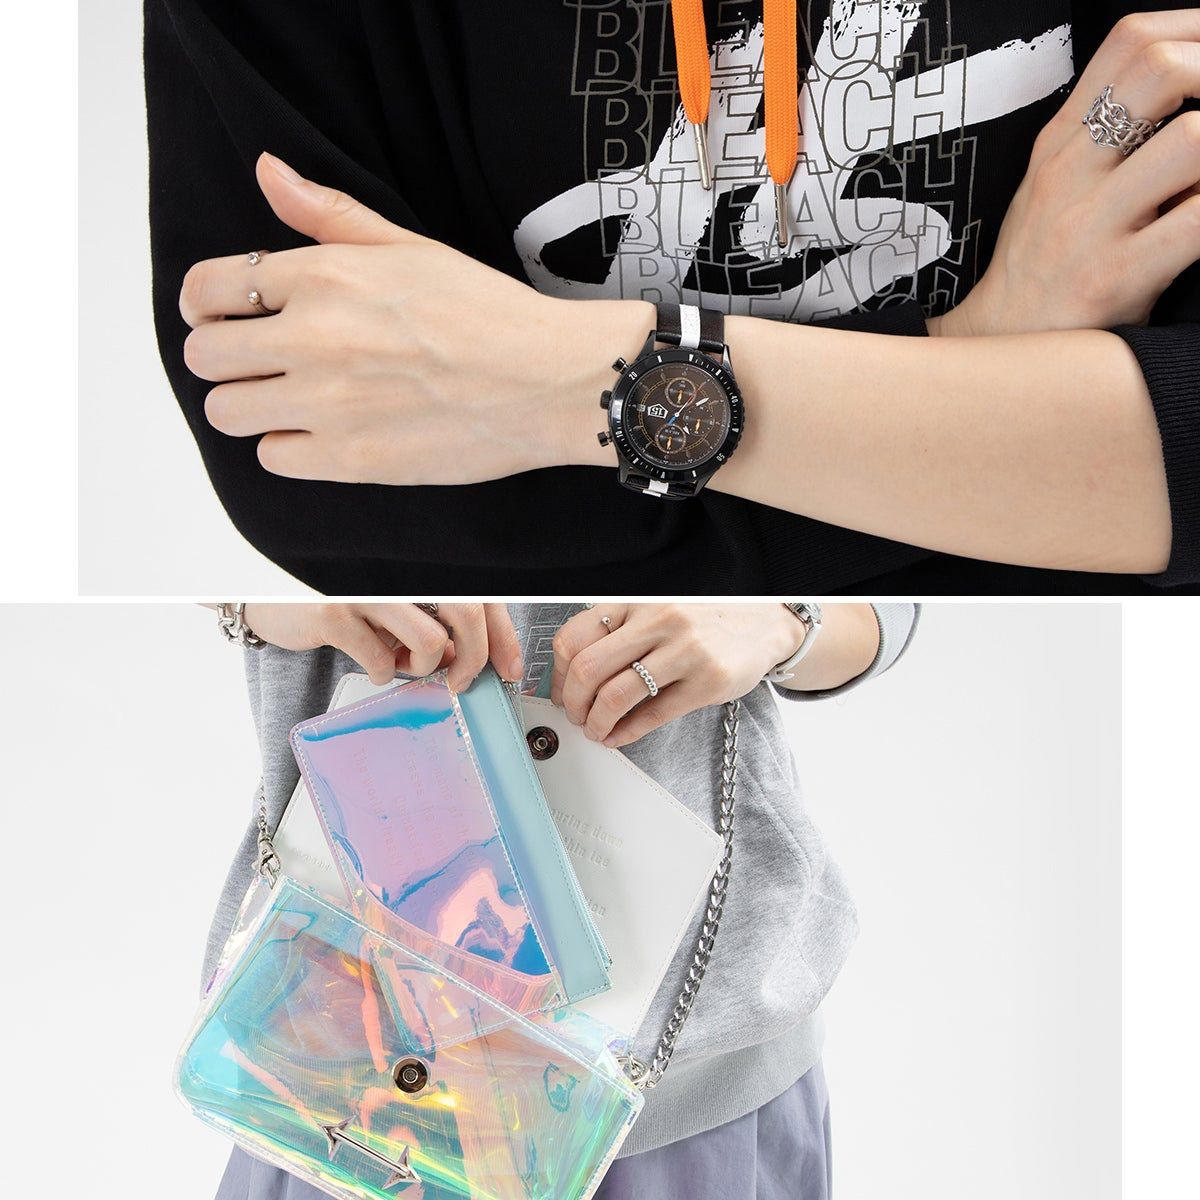 『BLEACH』より、黒崎一護と日番谷冬獅郎モデルのアイテムが新登場!